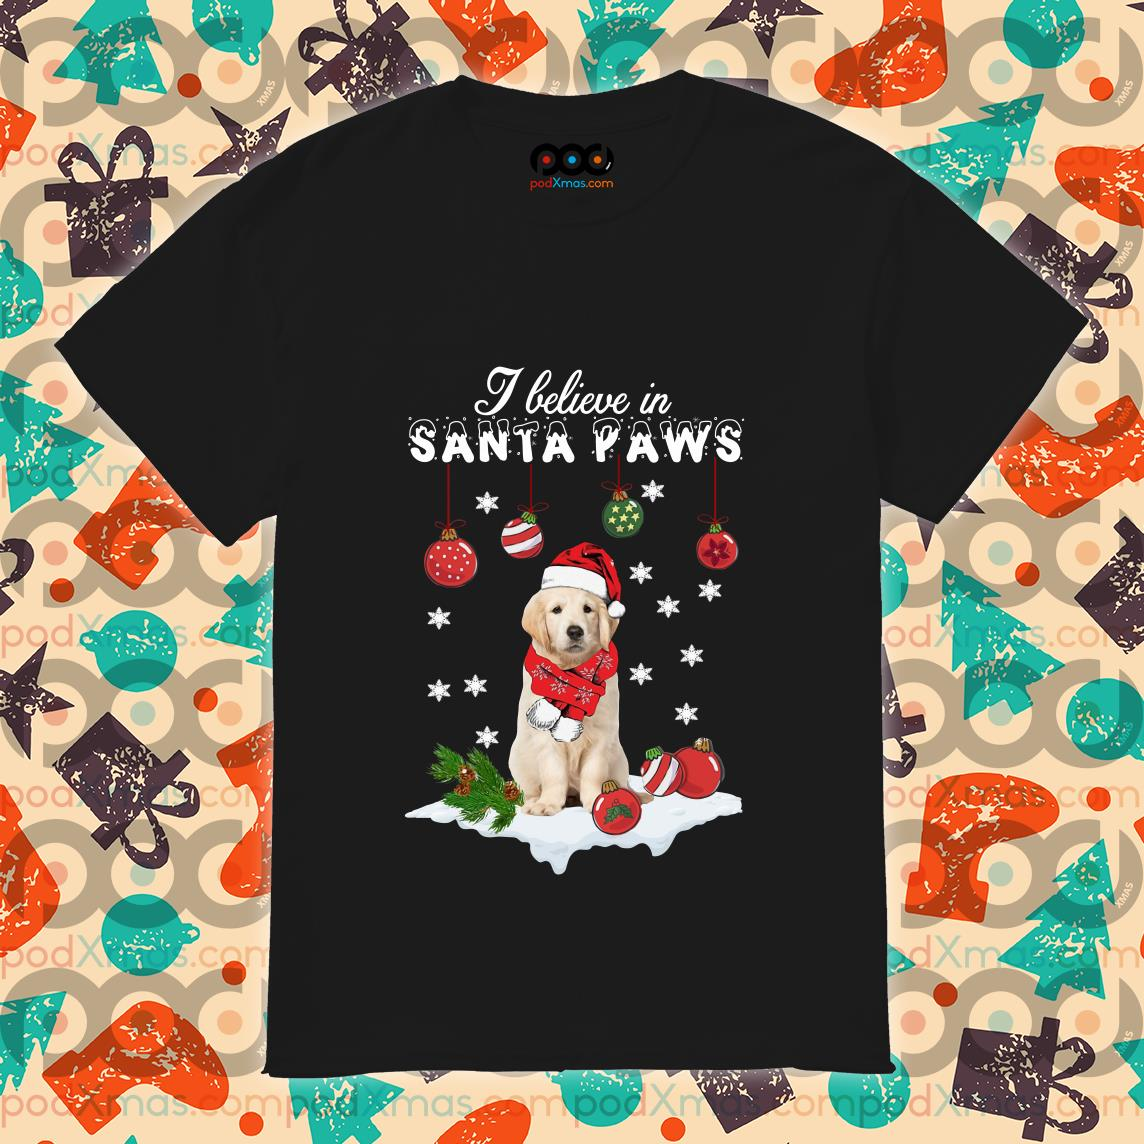 Golden Retriever I believe in Santa Paws Christmas shirt